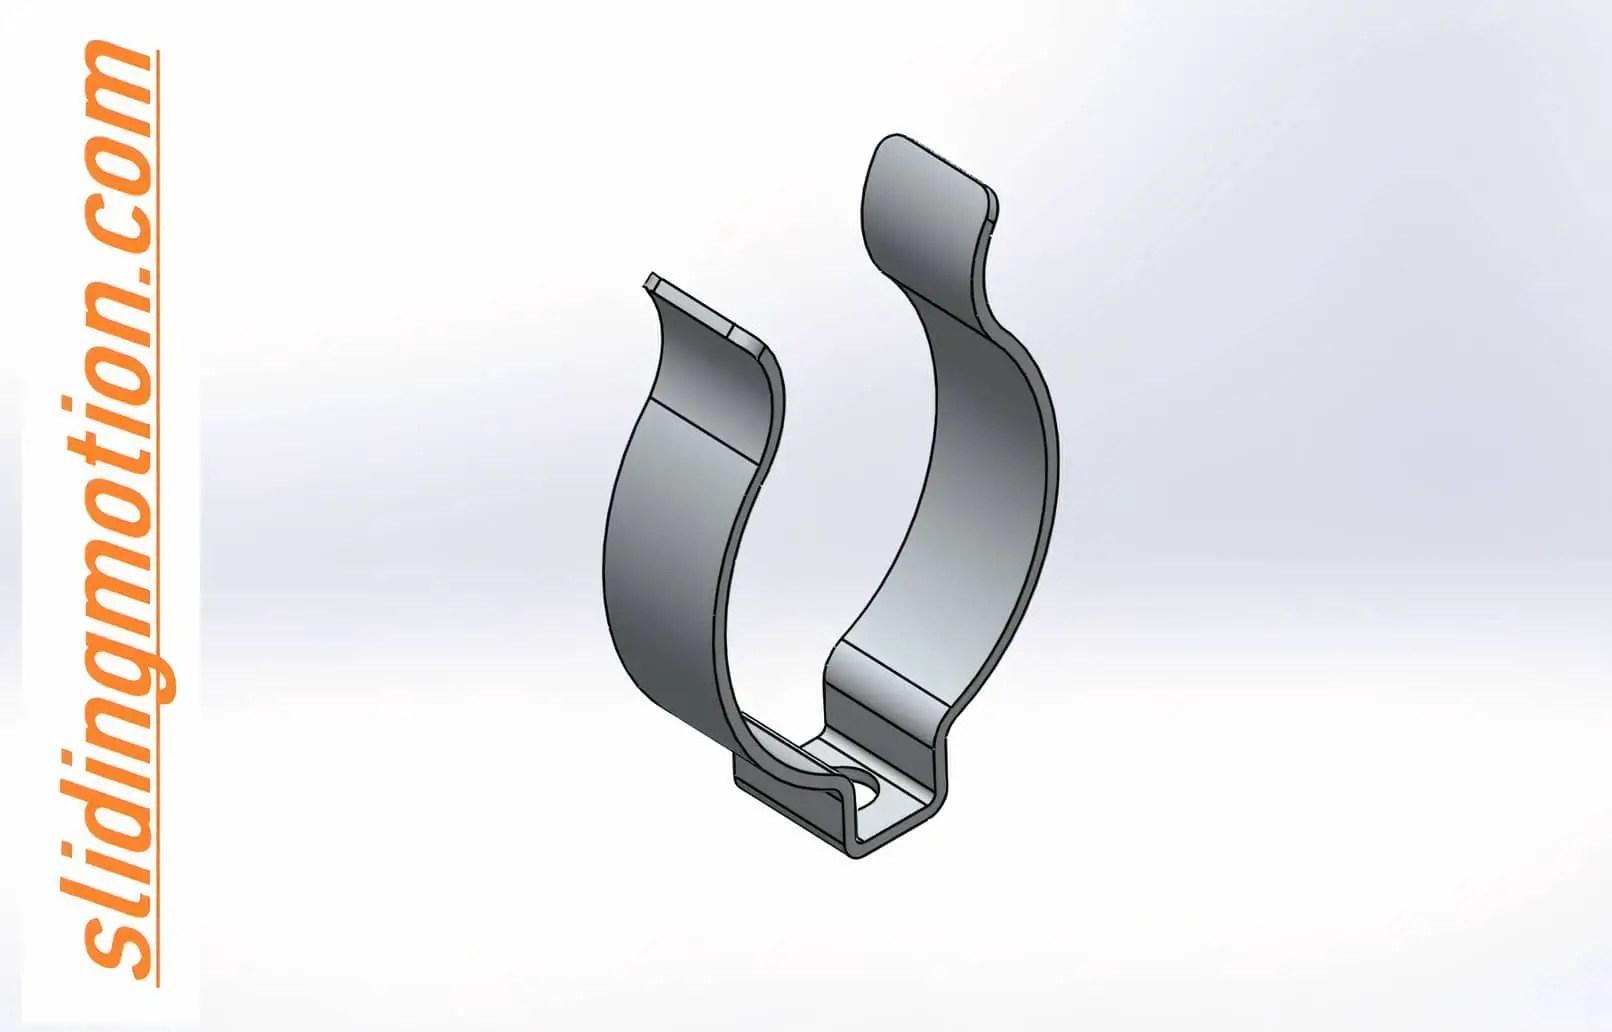 spring clips